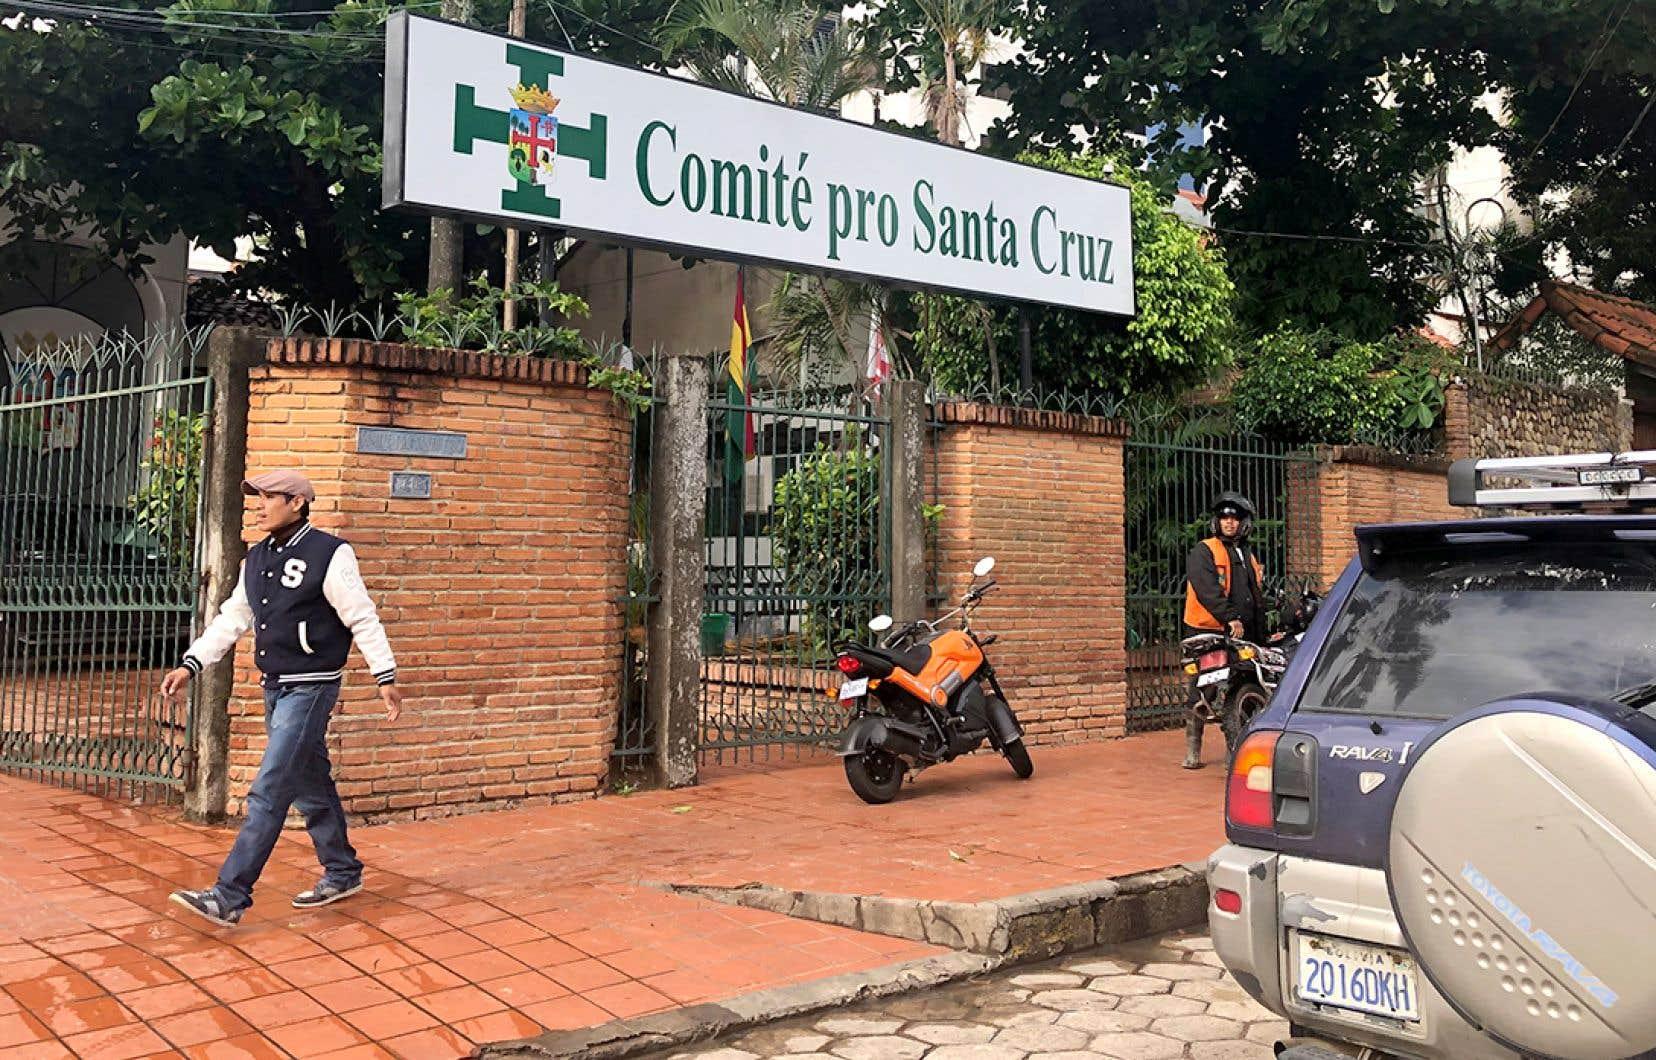 Le Comité pro Santa Cruz, que préside Luis Fernando Camacho